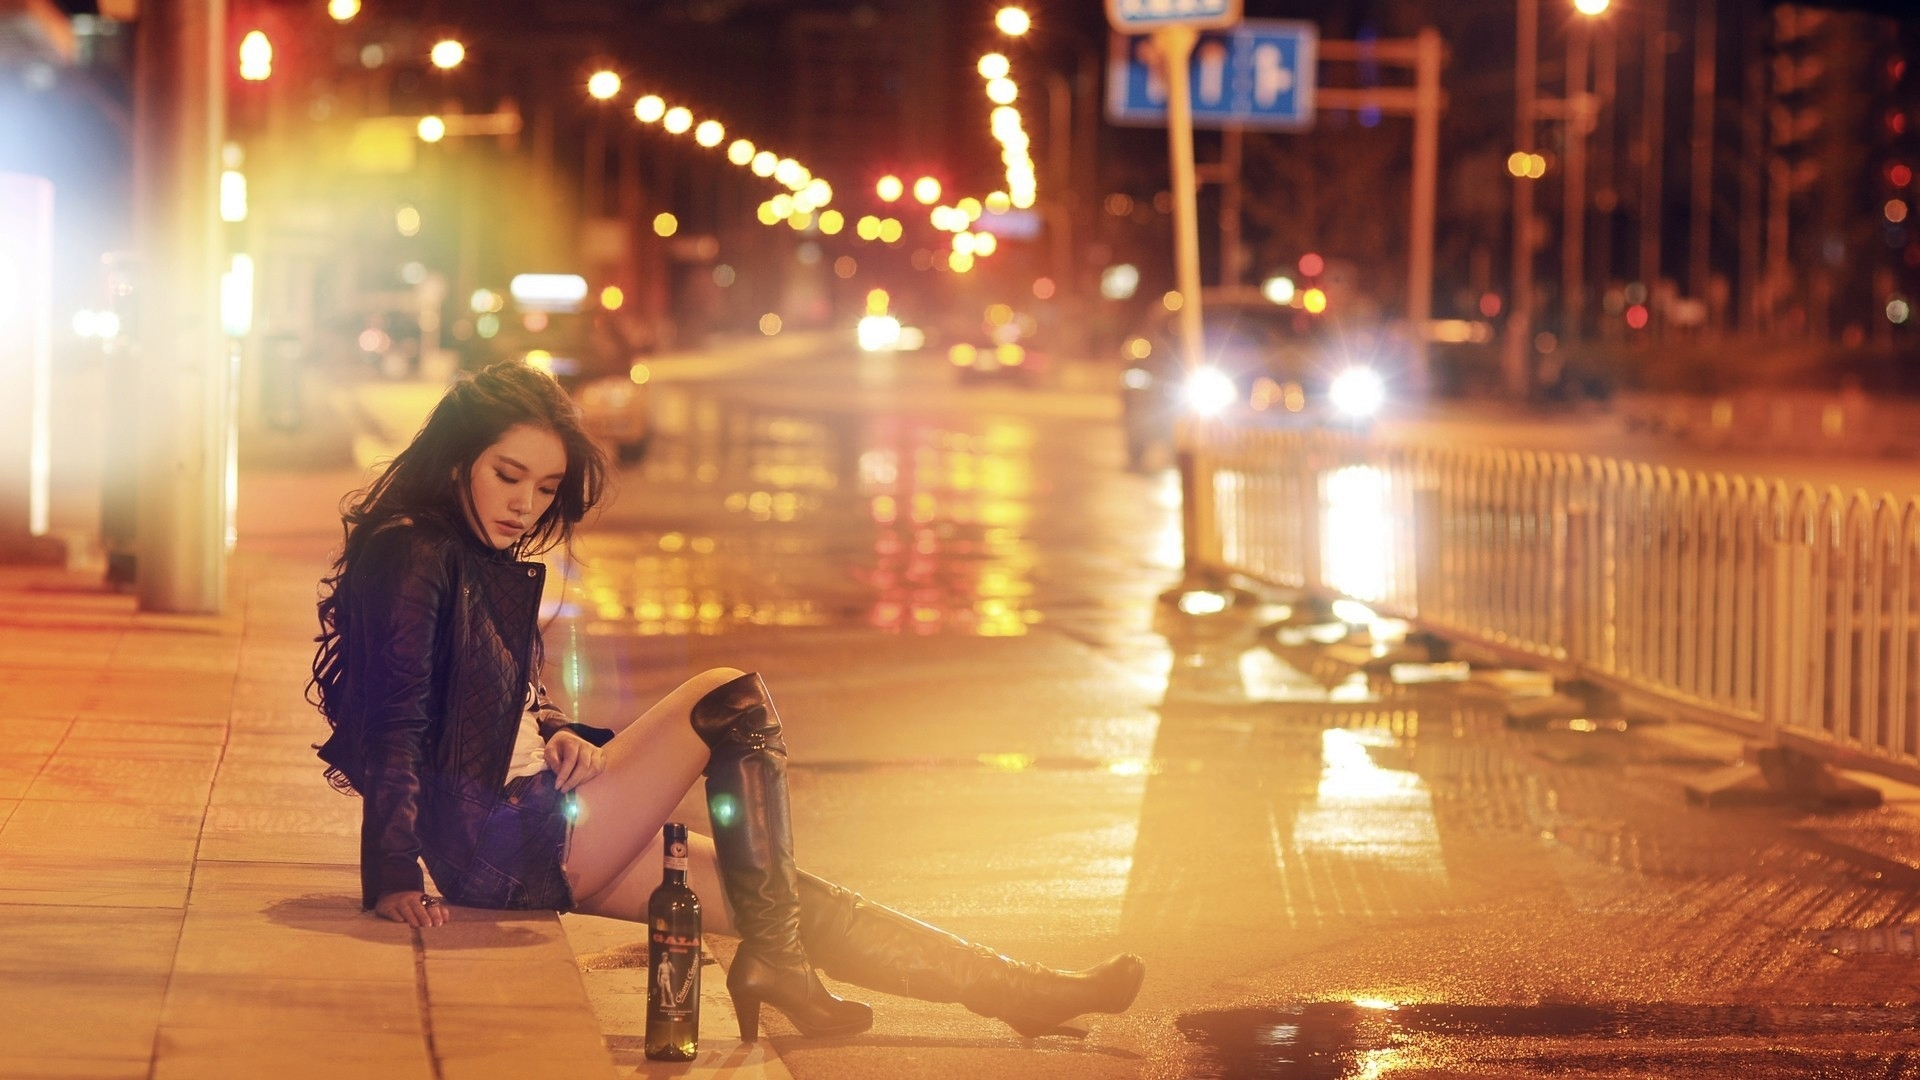 Sad Girl Standing Alone Wallpapers Wallpaper Women Outdoors City Street Night Bottles